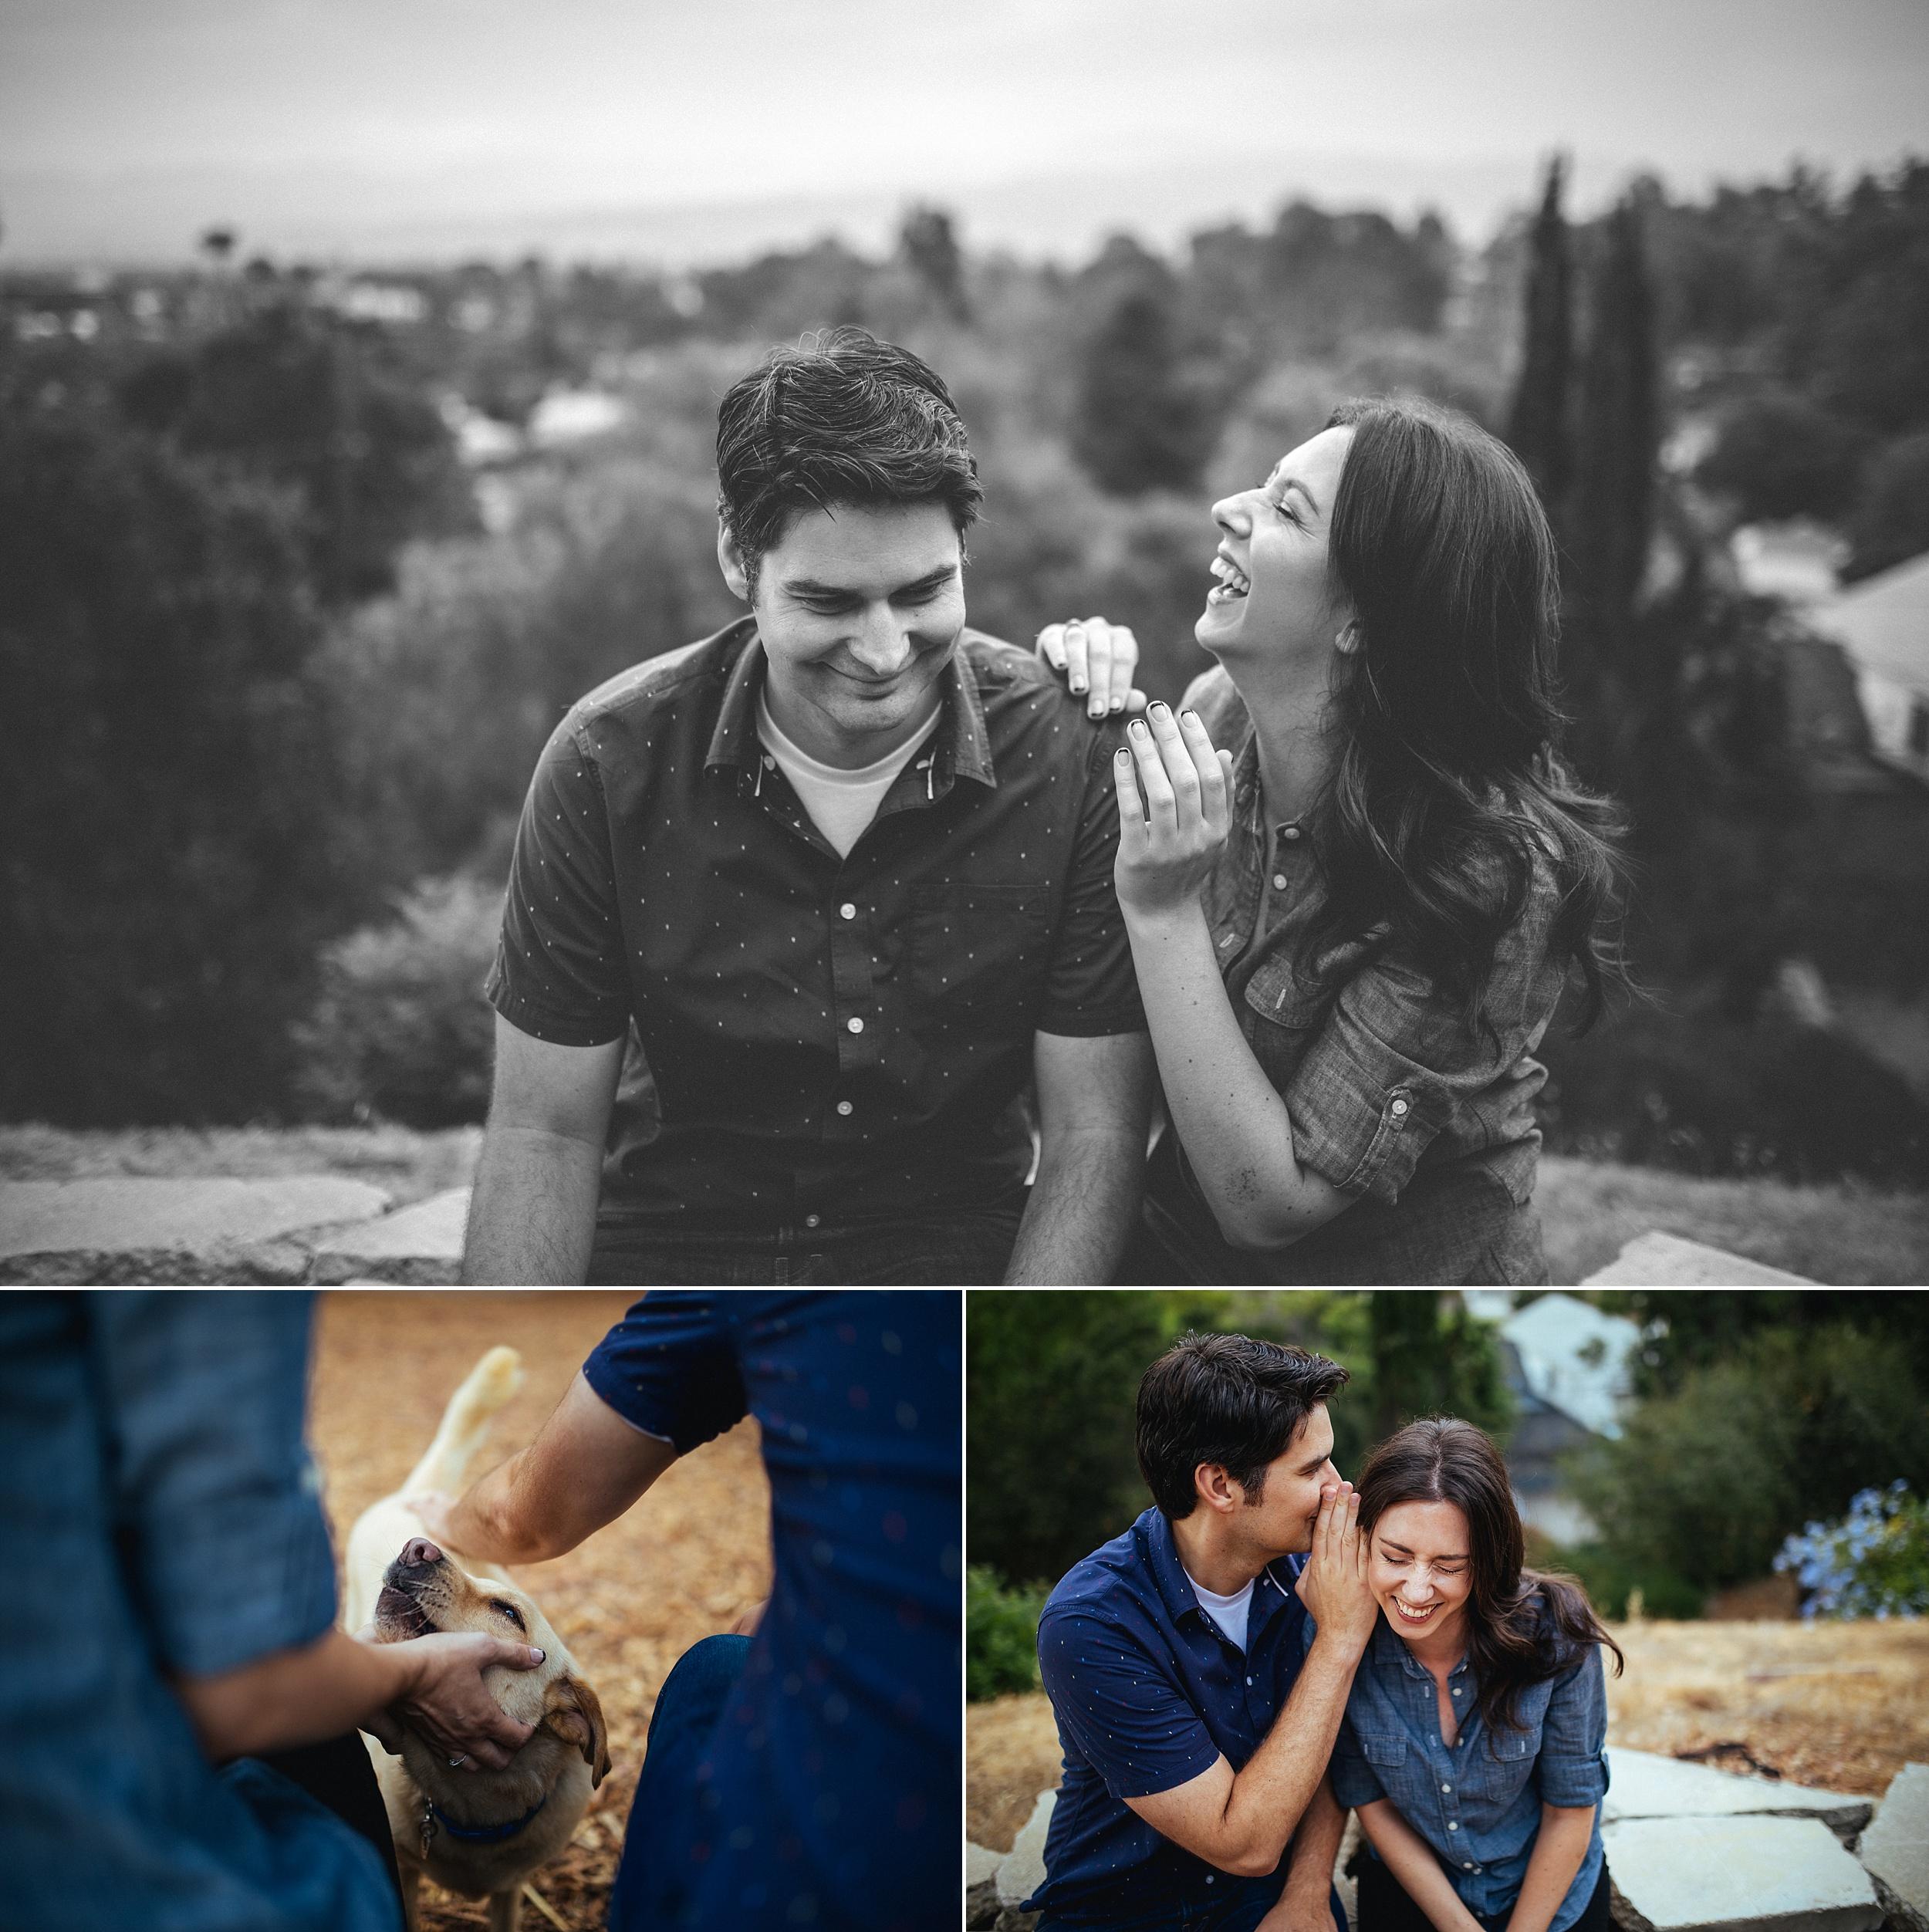 Studio-City-LA-Engagement-2.jpg